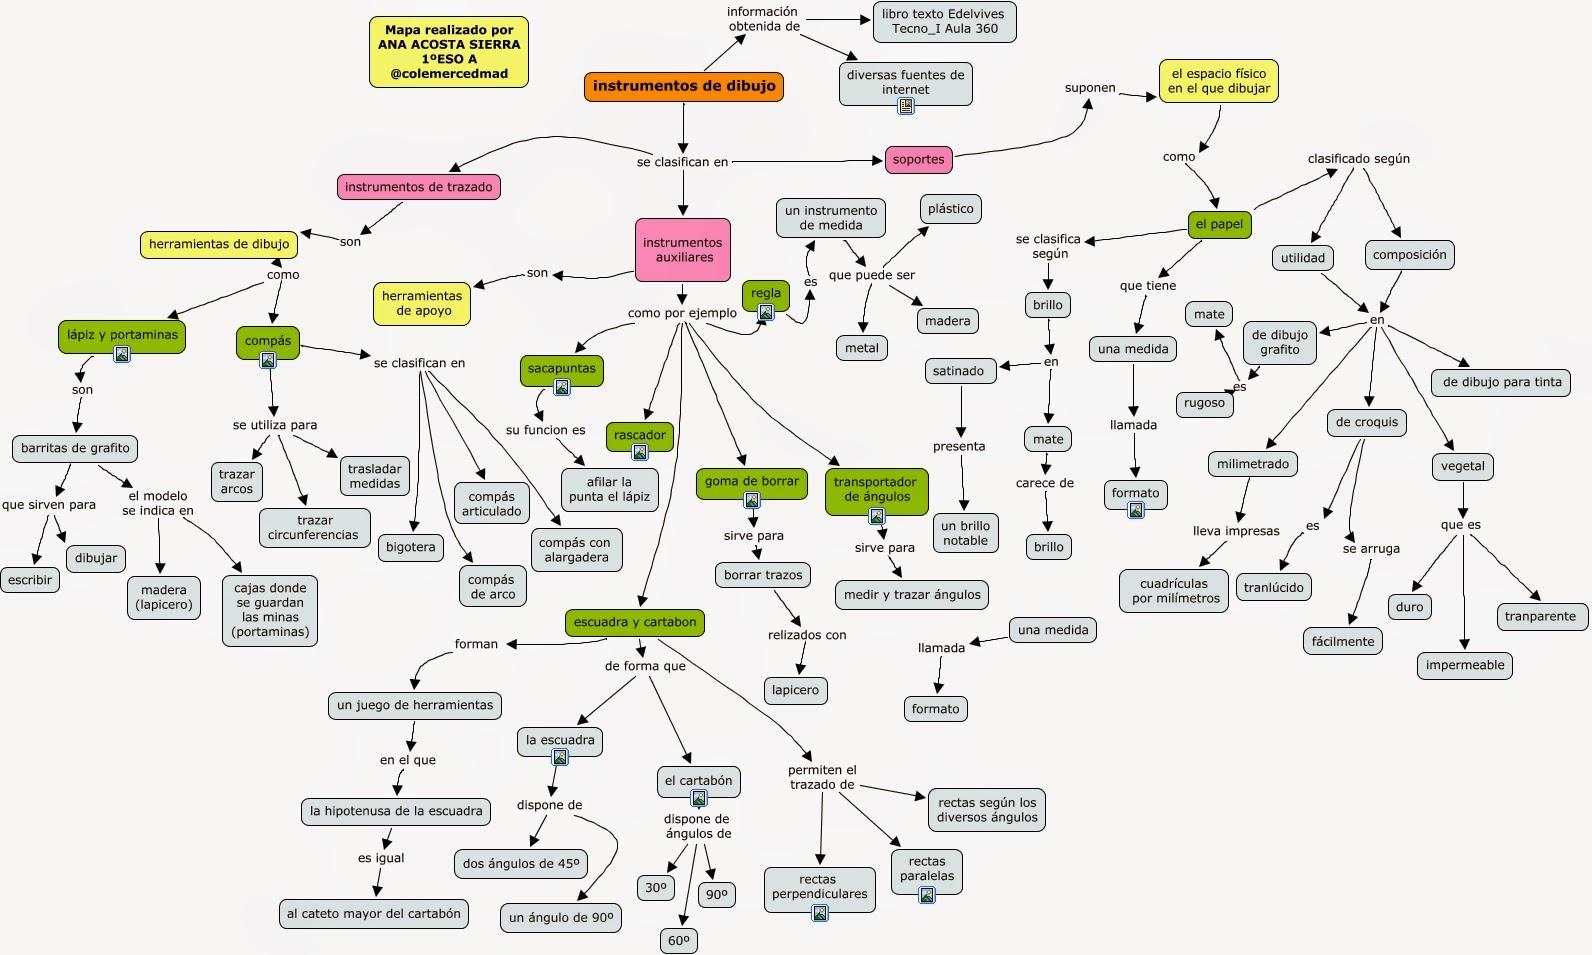 Estoy en ello mapa conceptual instrumentos de dibujo for Plano de planta dibujo tecnico